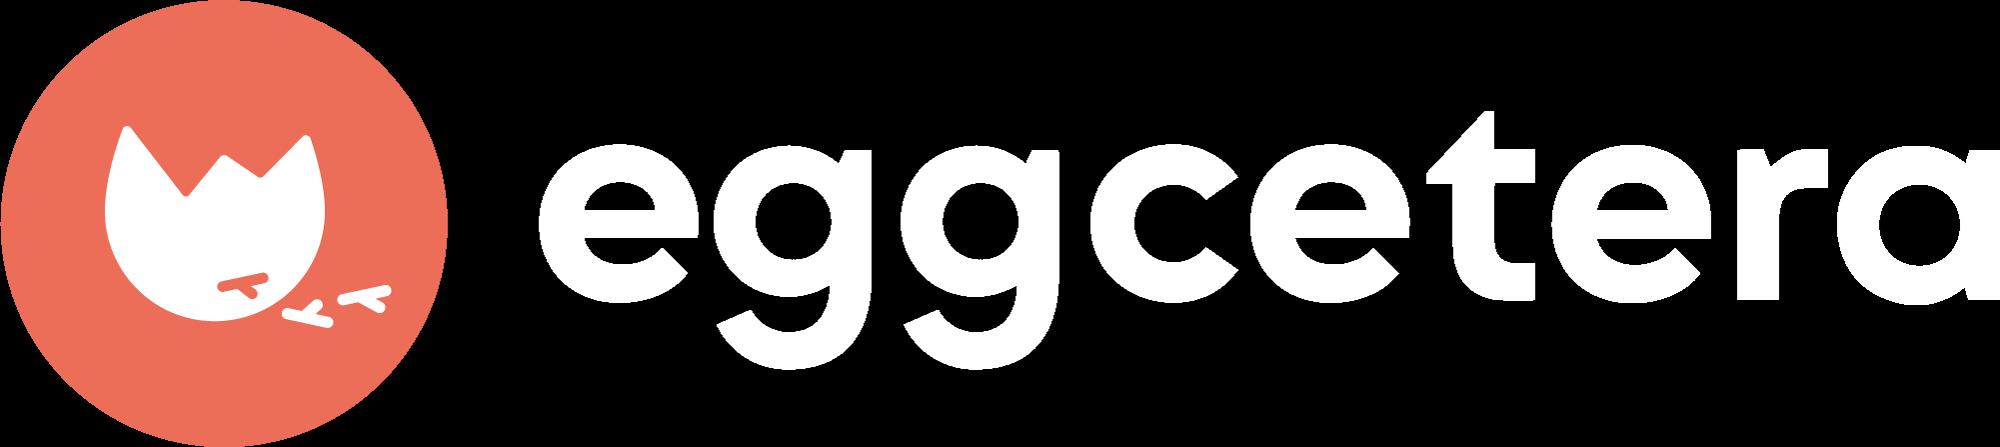 Agence Eggcetera